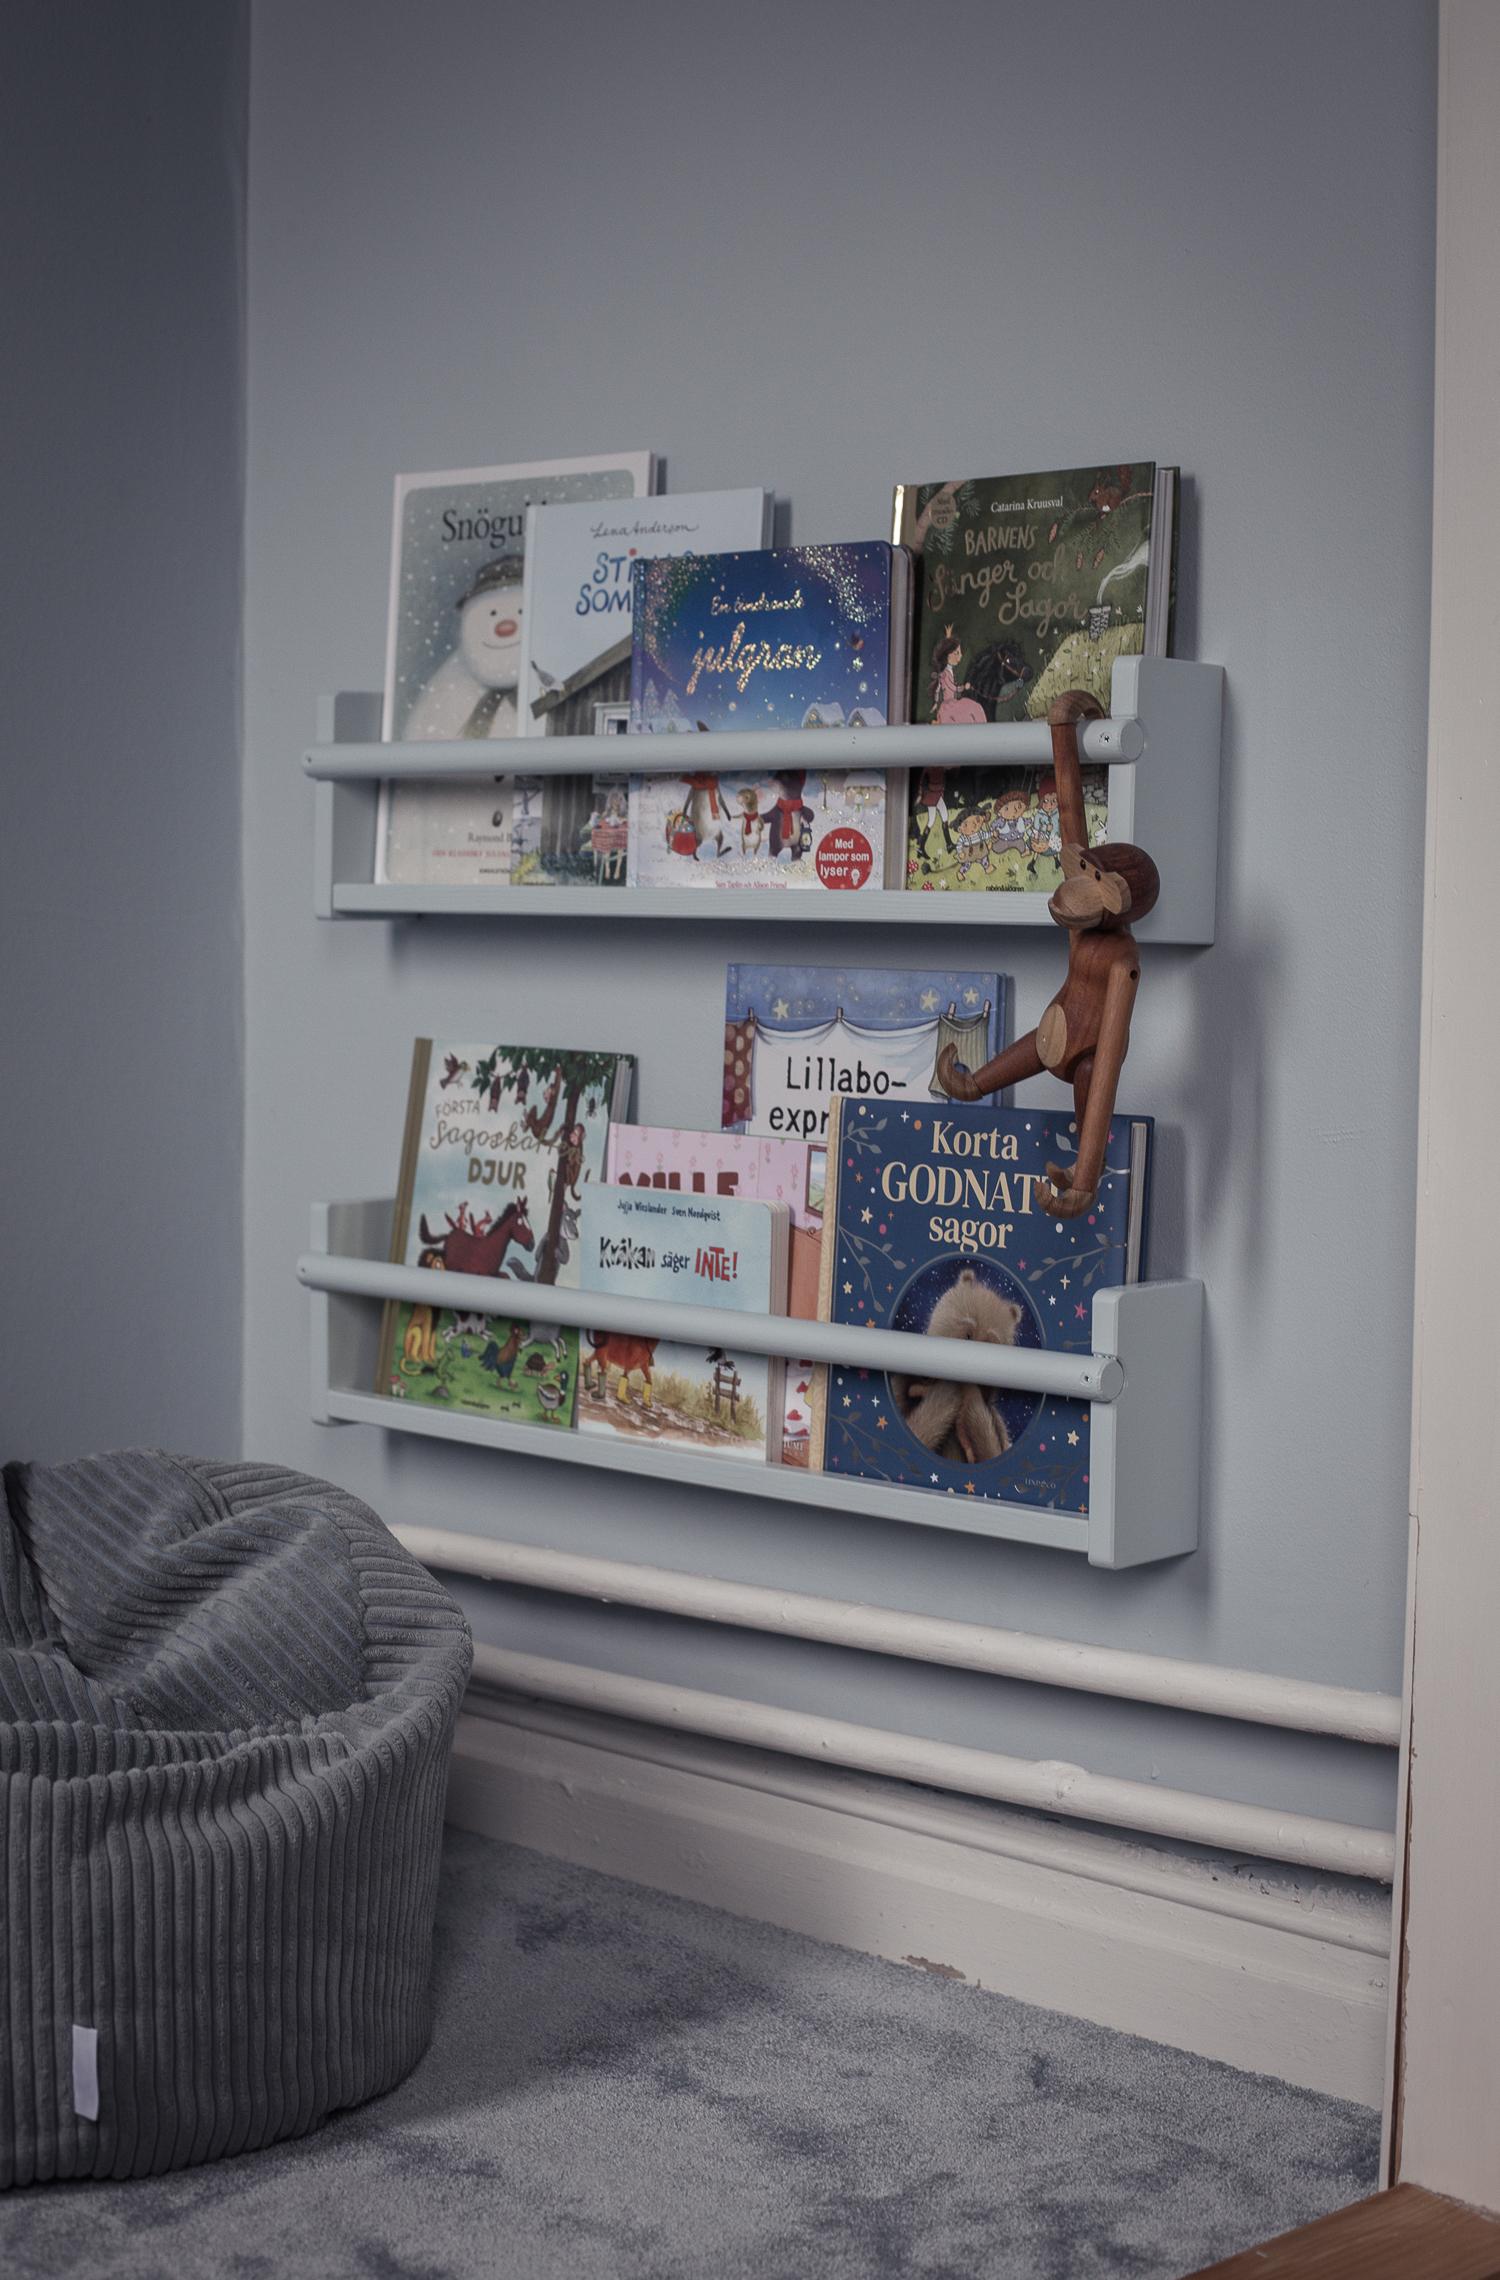 Ikea-hack bokhylla